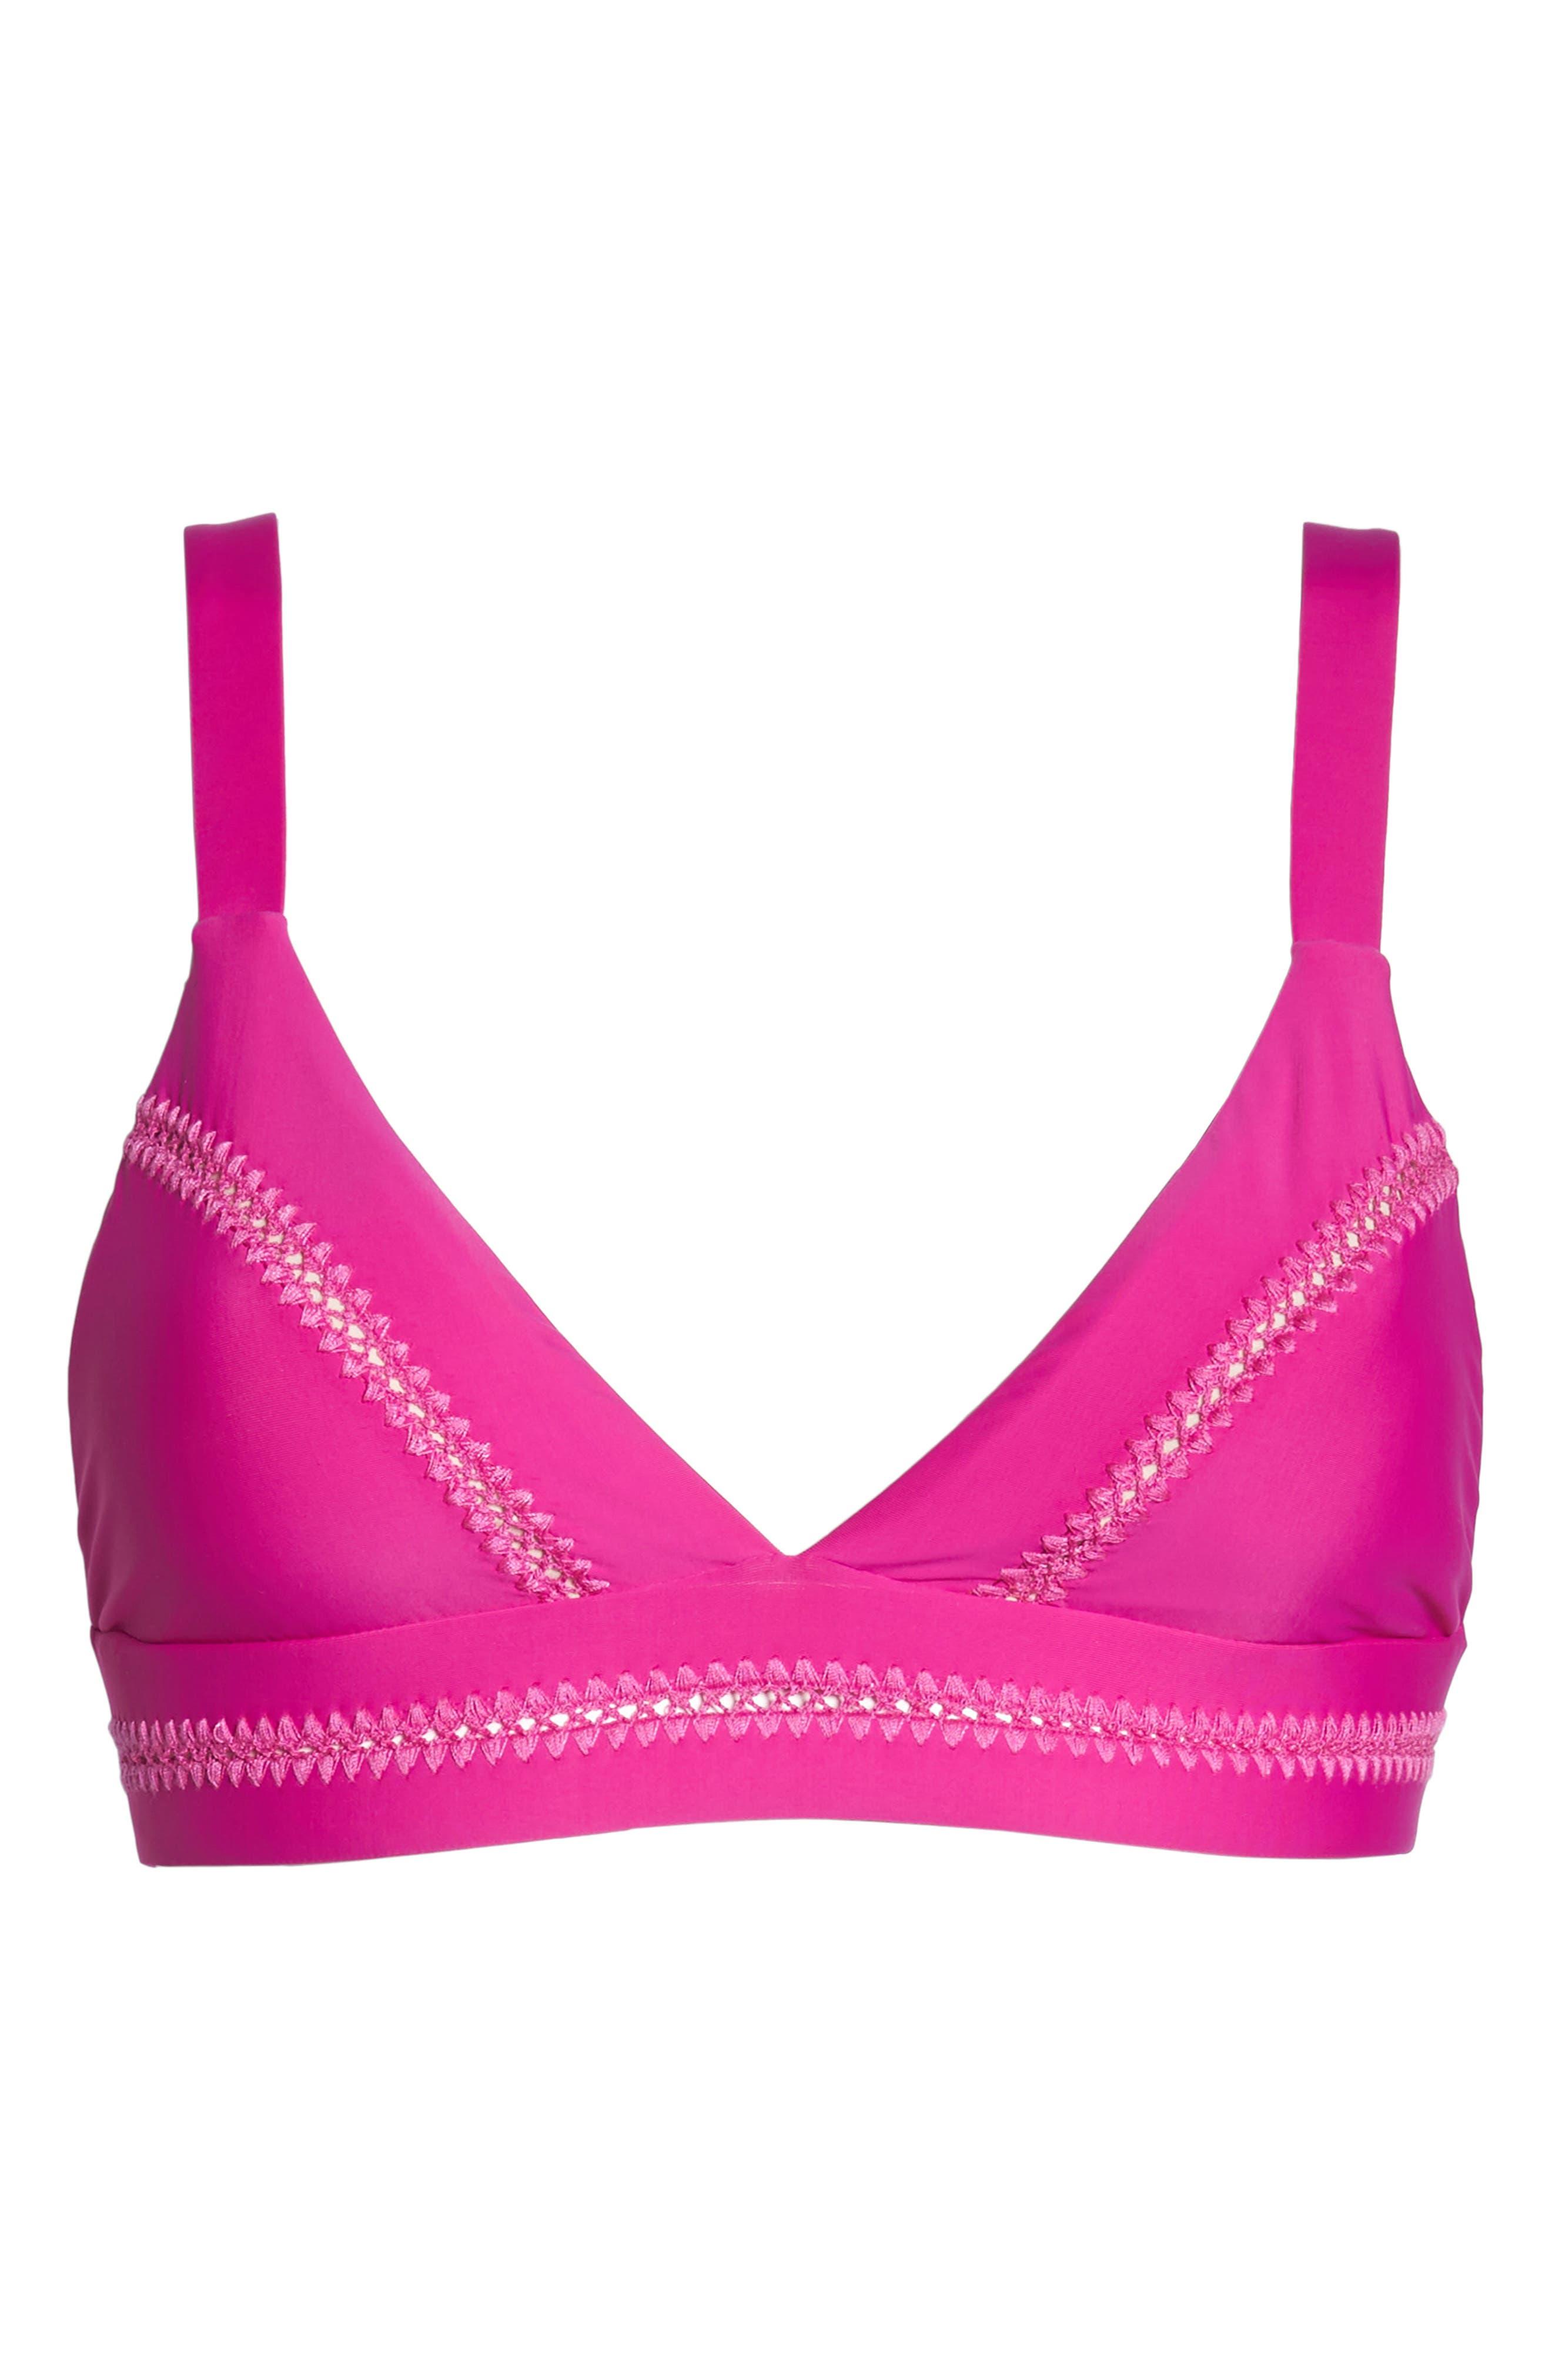 Stitched Elle Halter Bikini Top,                             Alternate thumbnail 10, color,                             Fuchsia